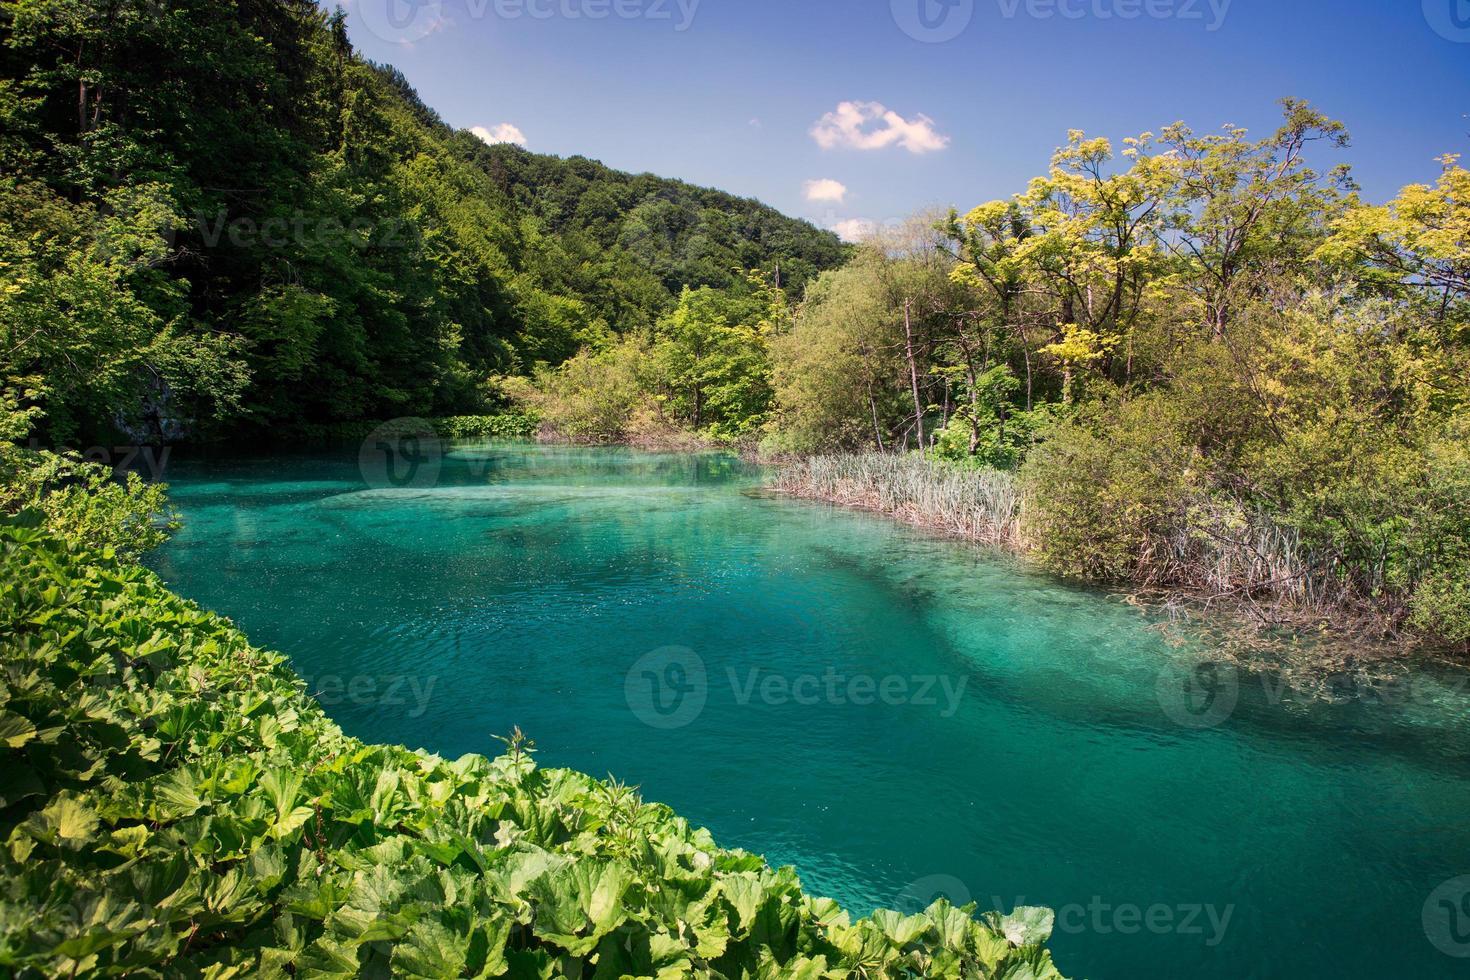 sjö i nationalparken Plitvice sjöar foto